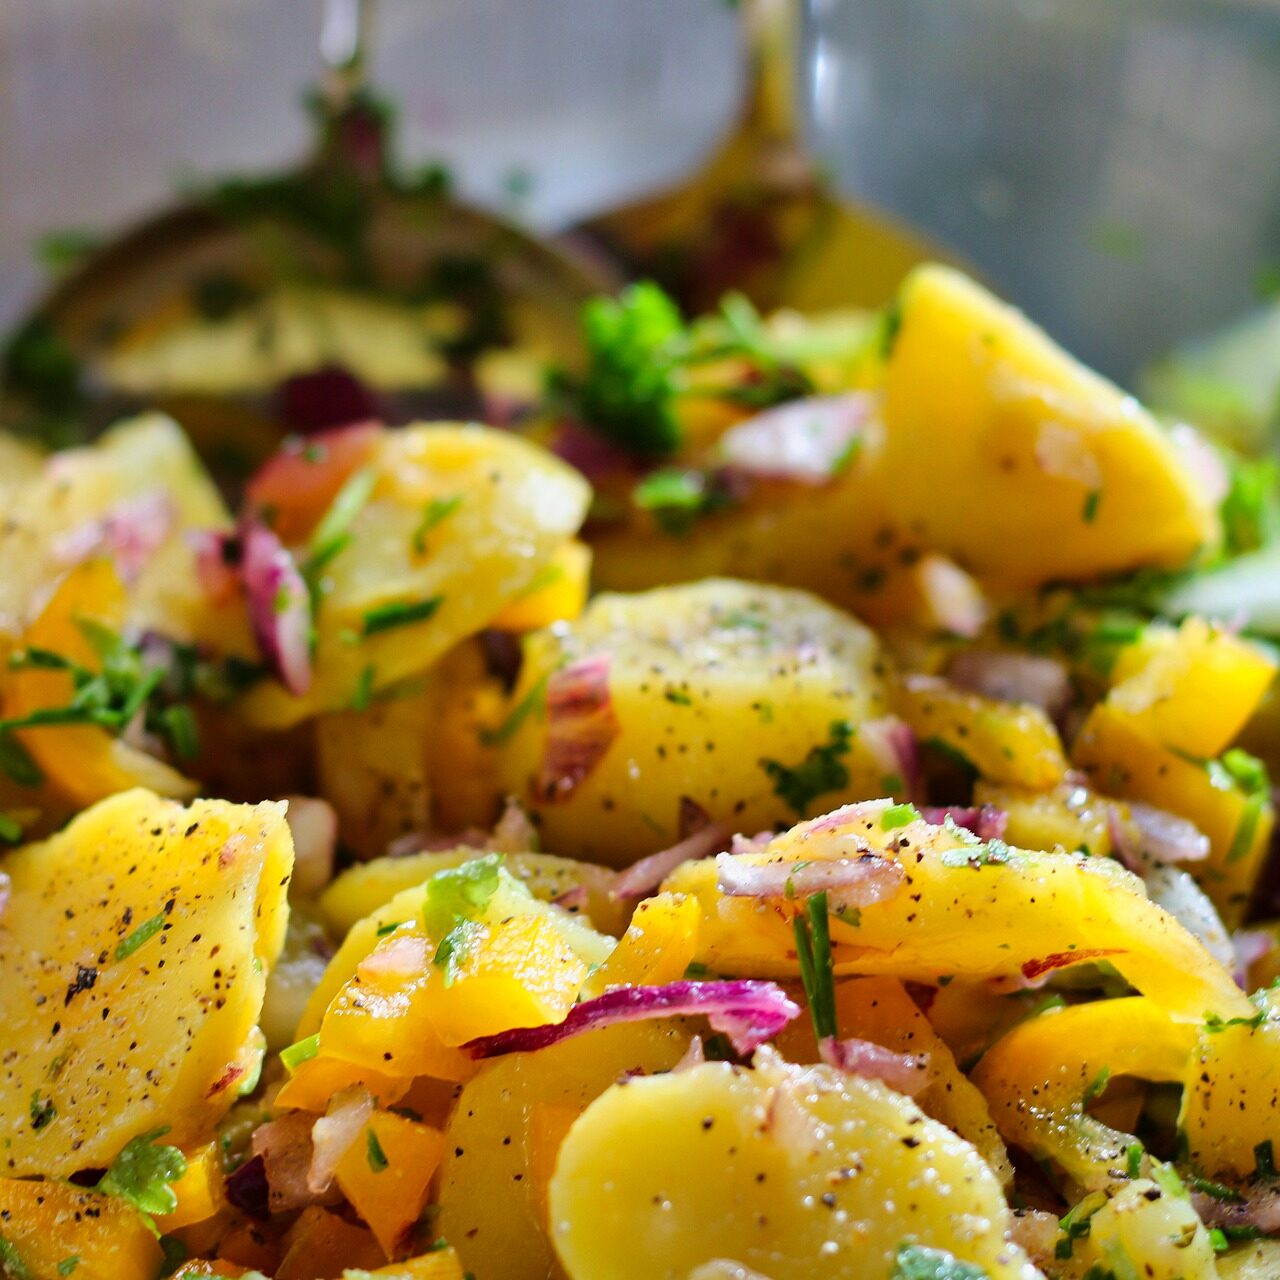 potato-salad-4836398_1920